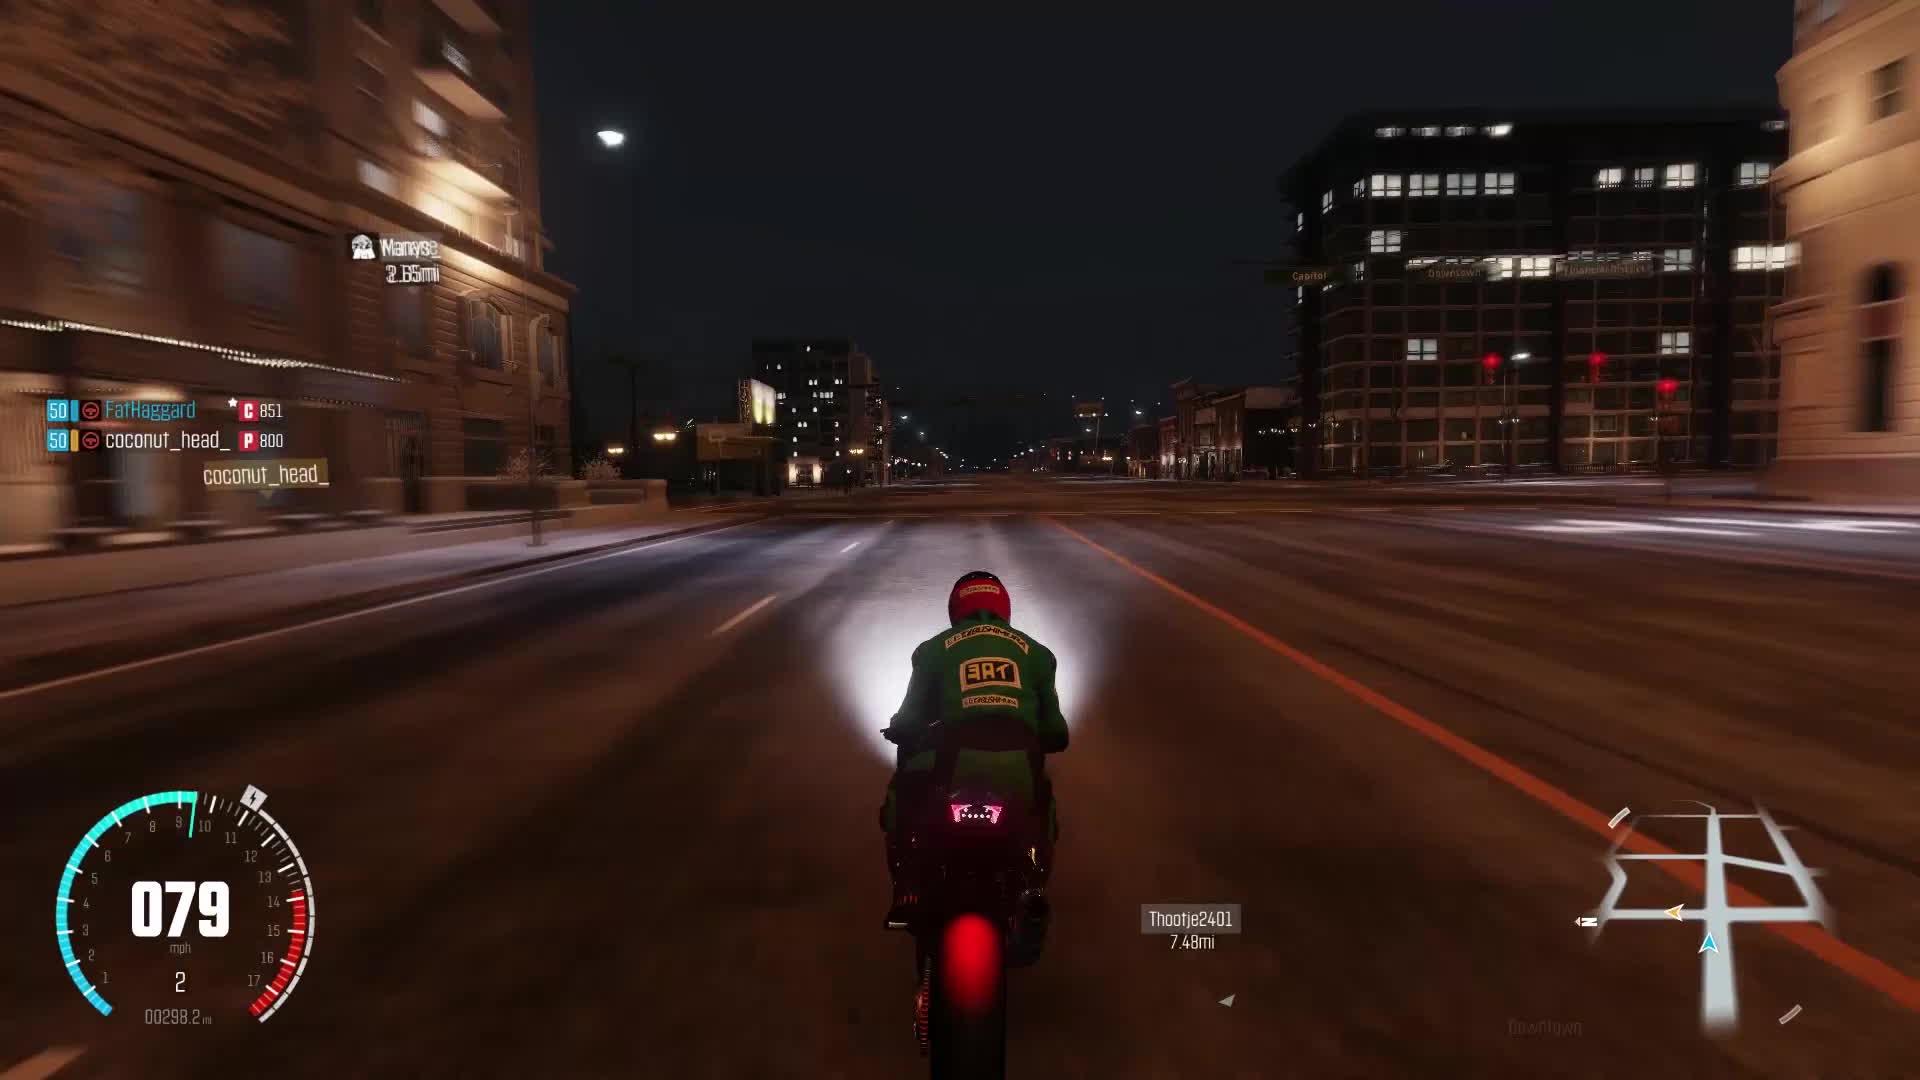 GamePhysics, Bike Launch GIFs